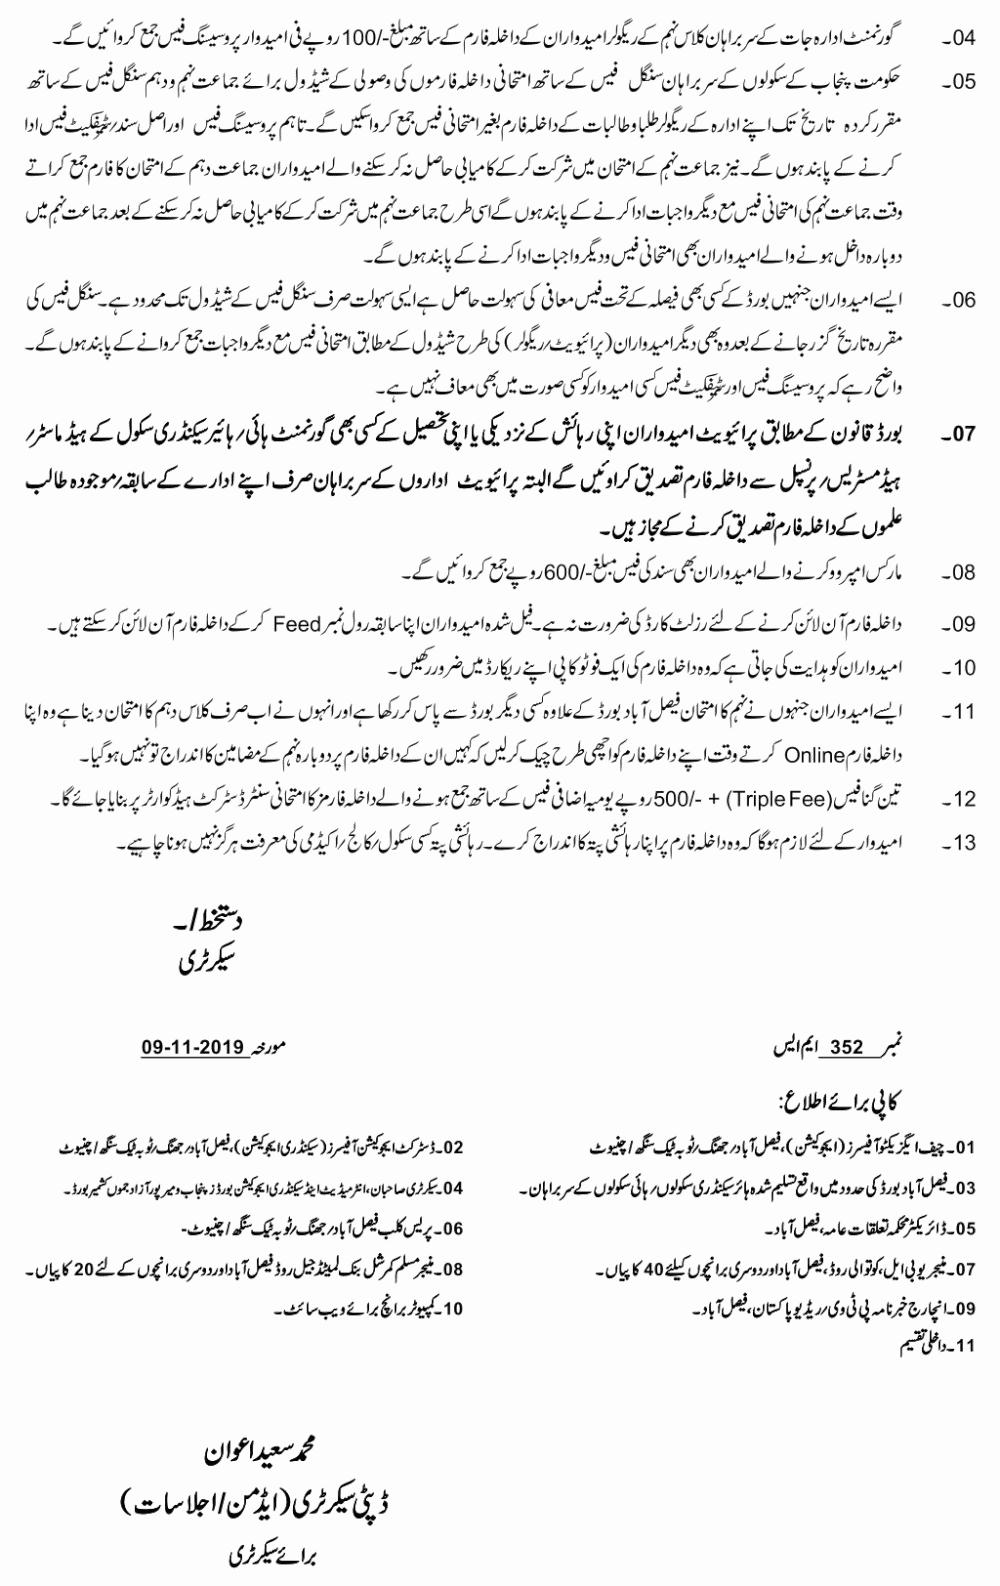 Faisalabad-board-ssc-exam-schedule-2020-page2